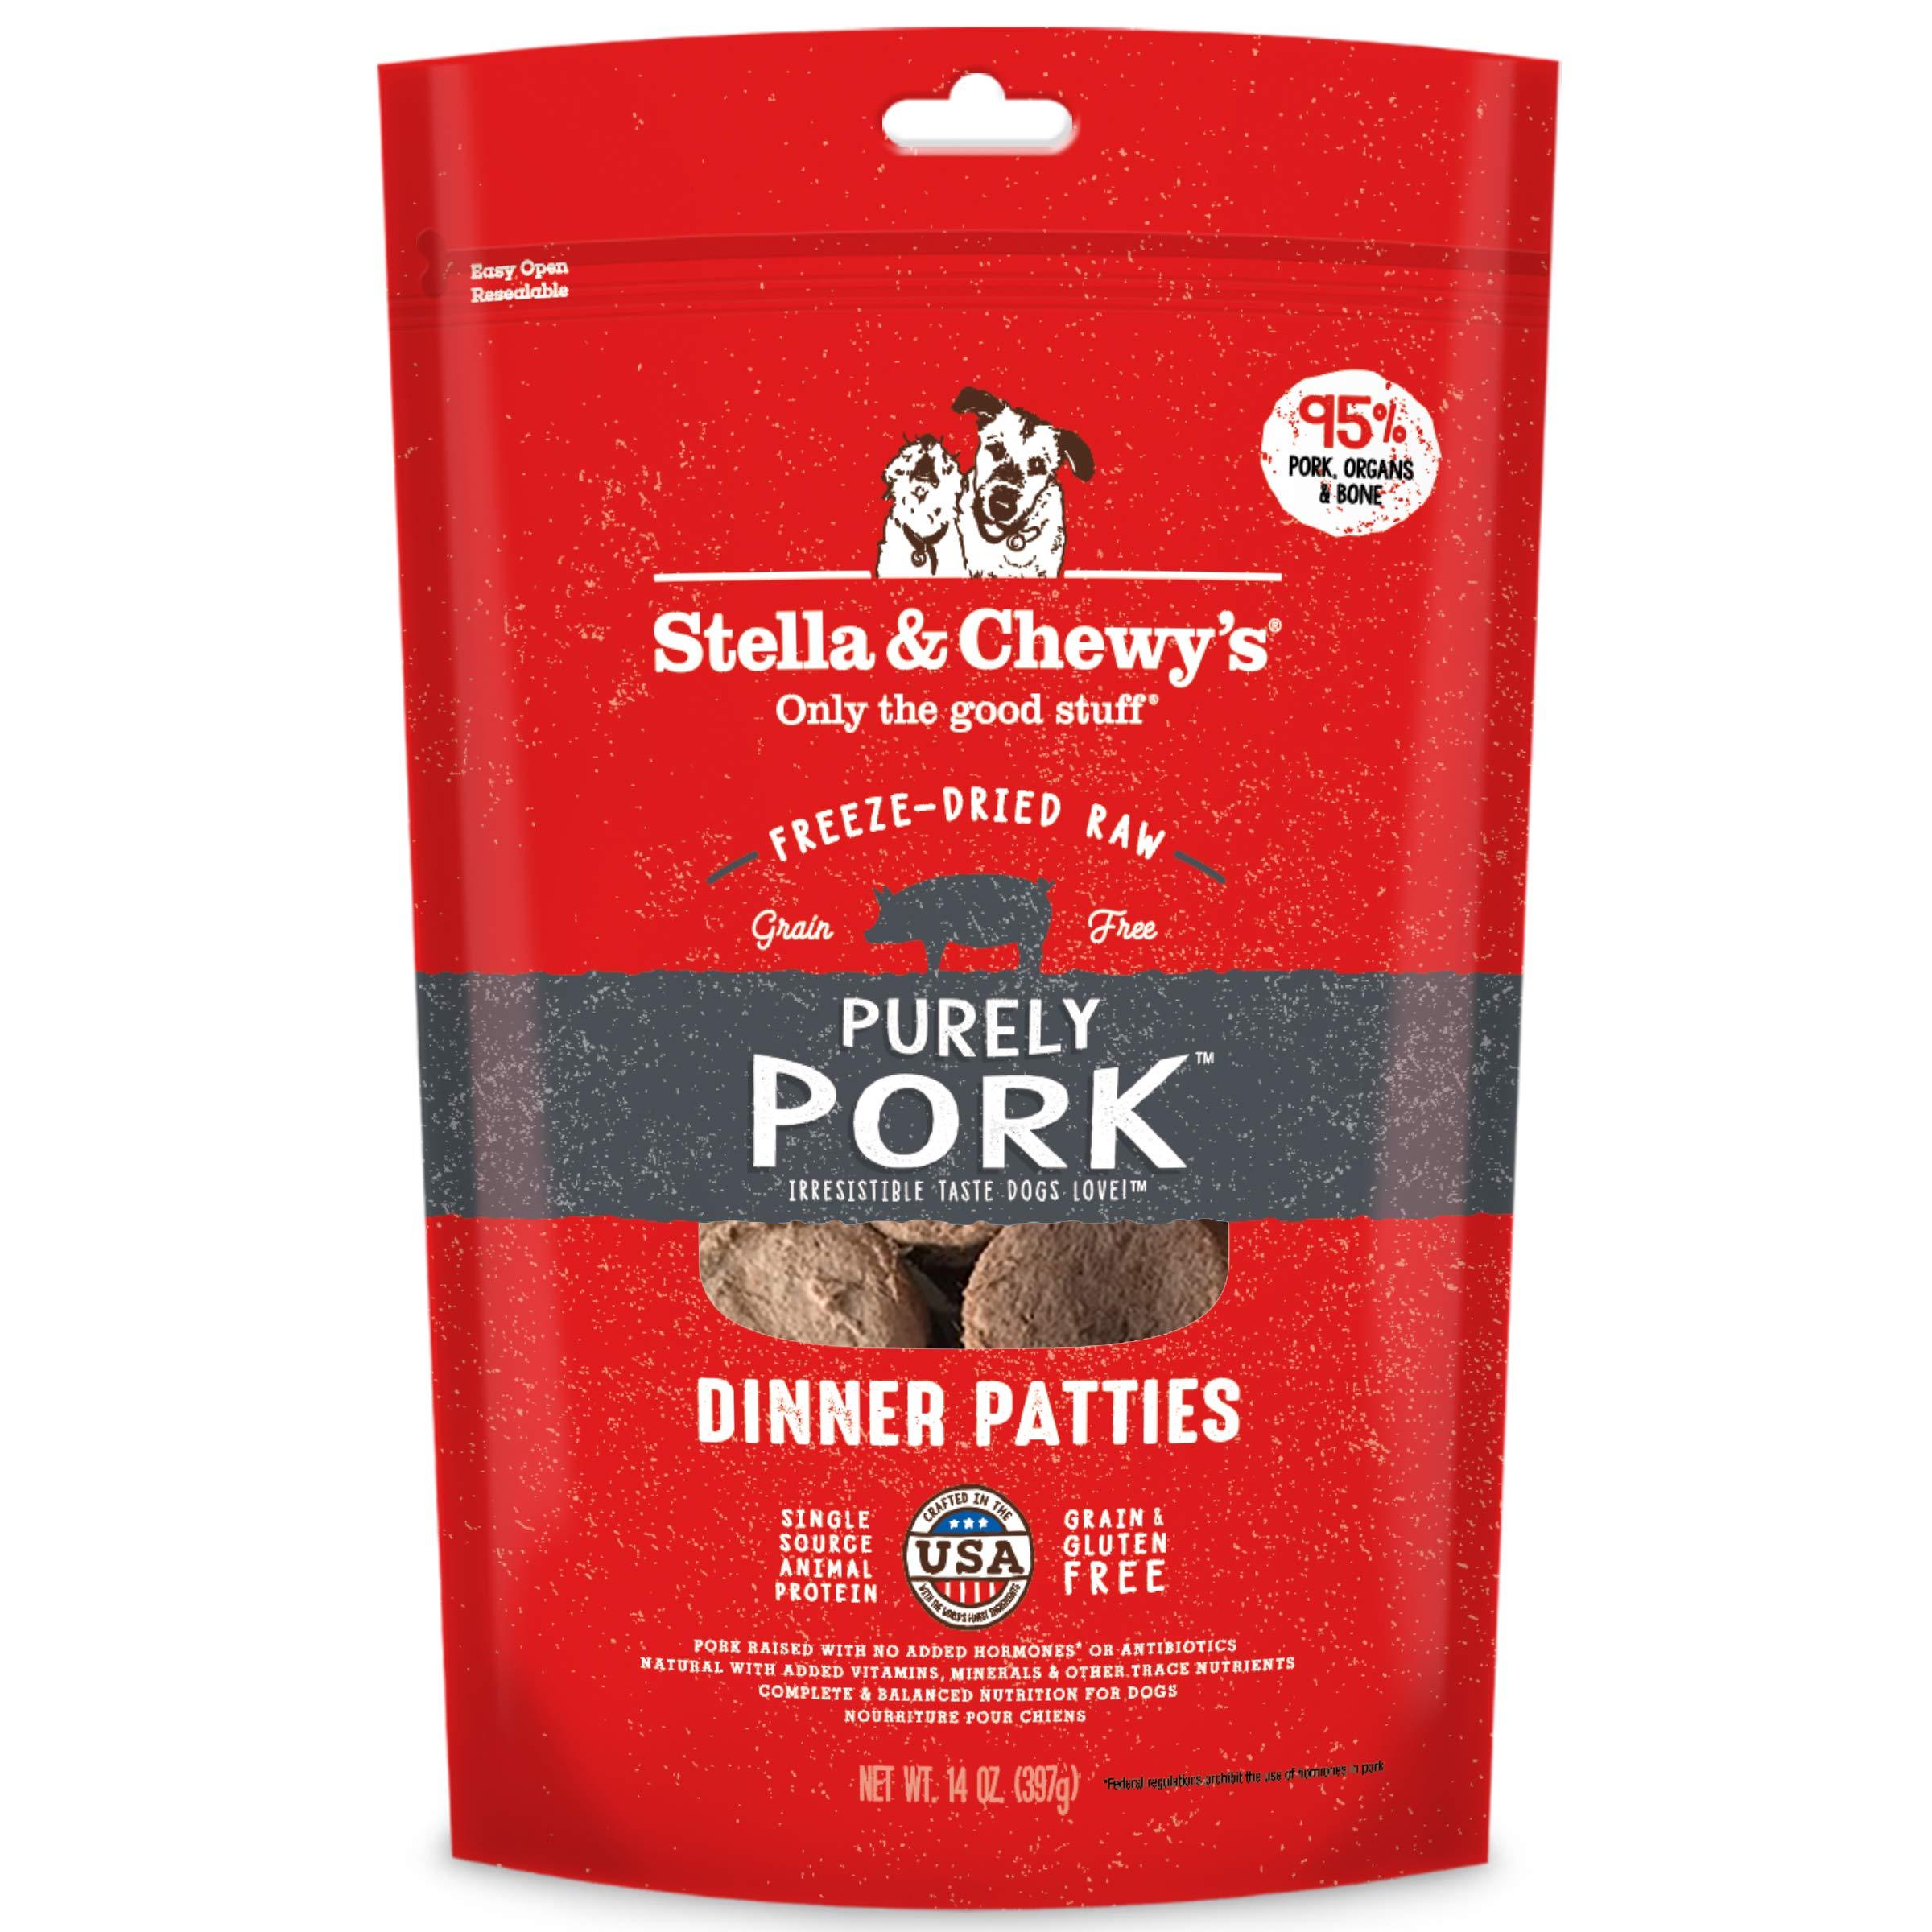 Stella & Chewy's Freeze-Dried Raw Purely Pork Dinner Patties Dog Food, 14 oz. Bag by Stella & Chewy's